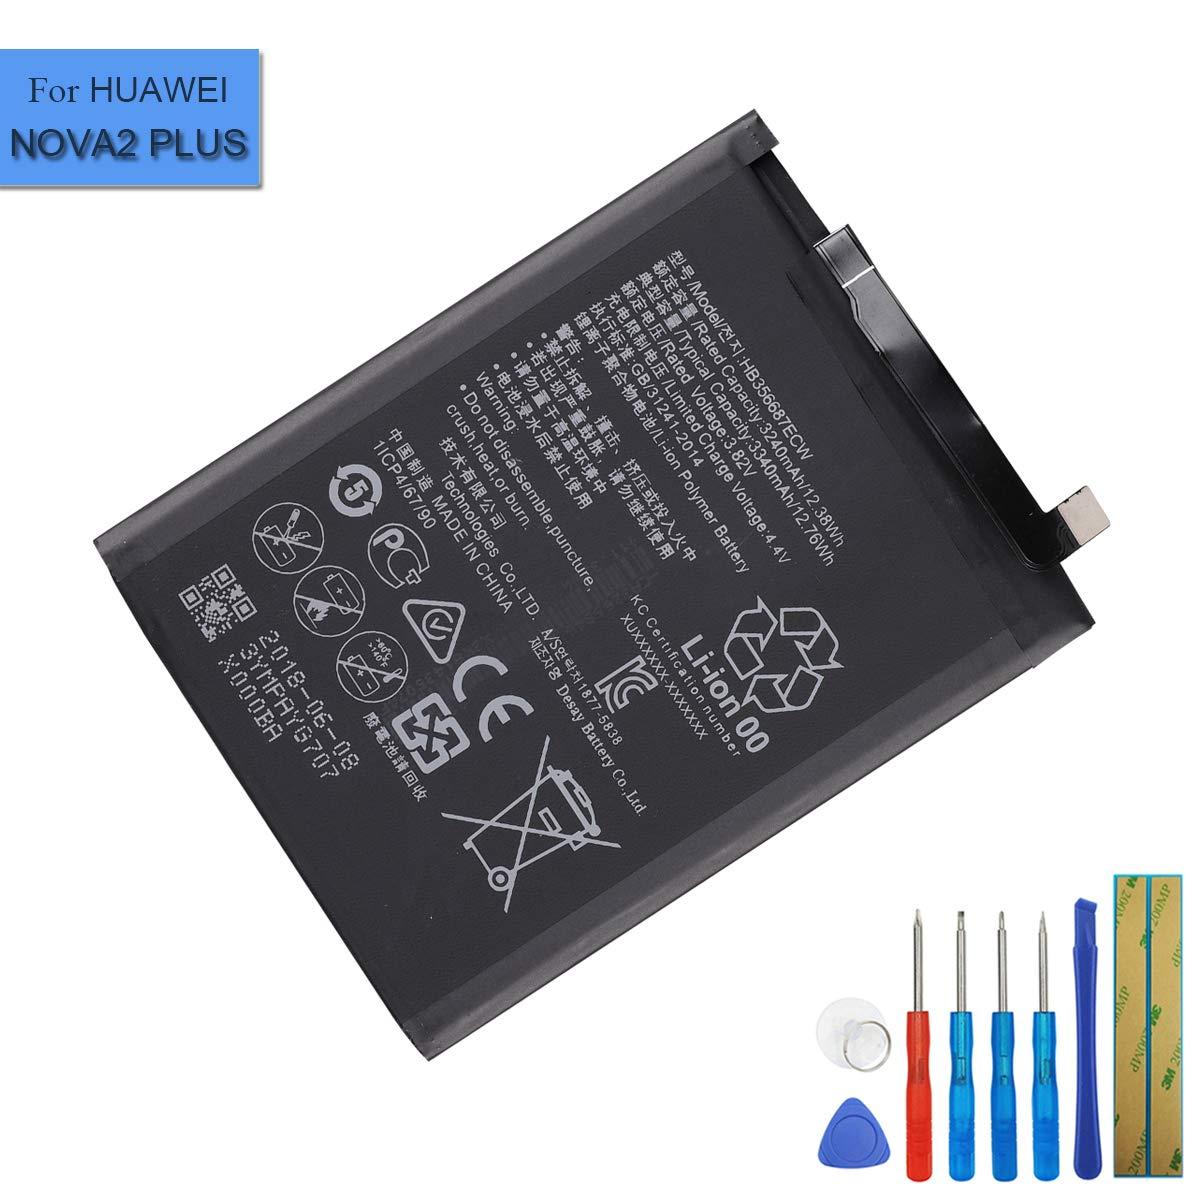 Bateria Celular Hb356687ecw Compatible Con Huawei Mate Se Honor 7x Nova 2 Plus Dual Sim 3340mah Con Herramientas